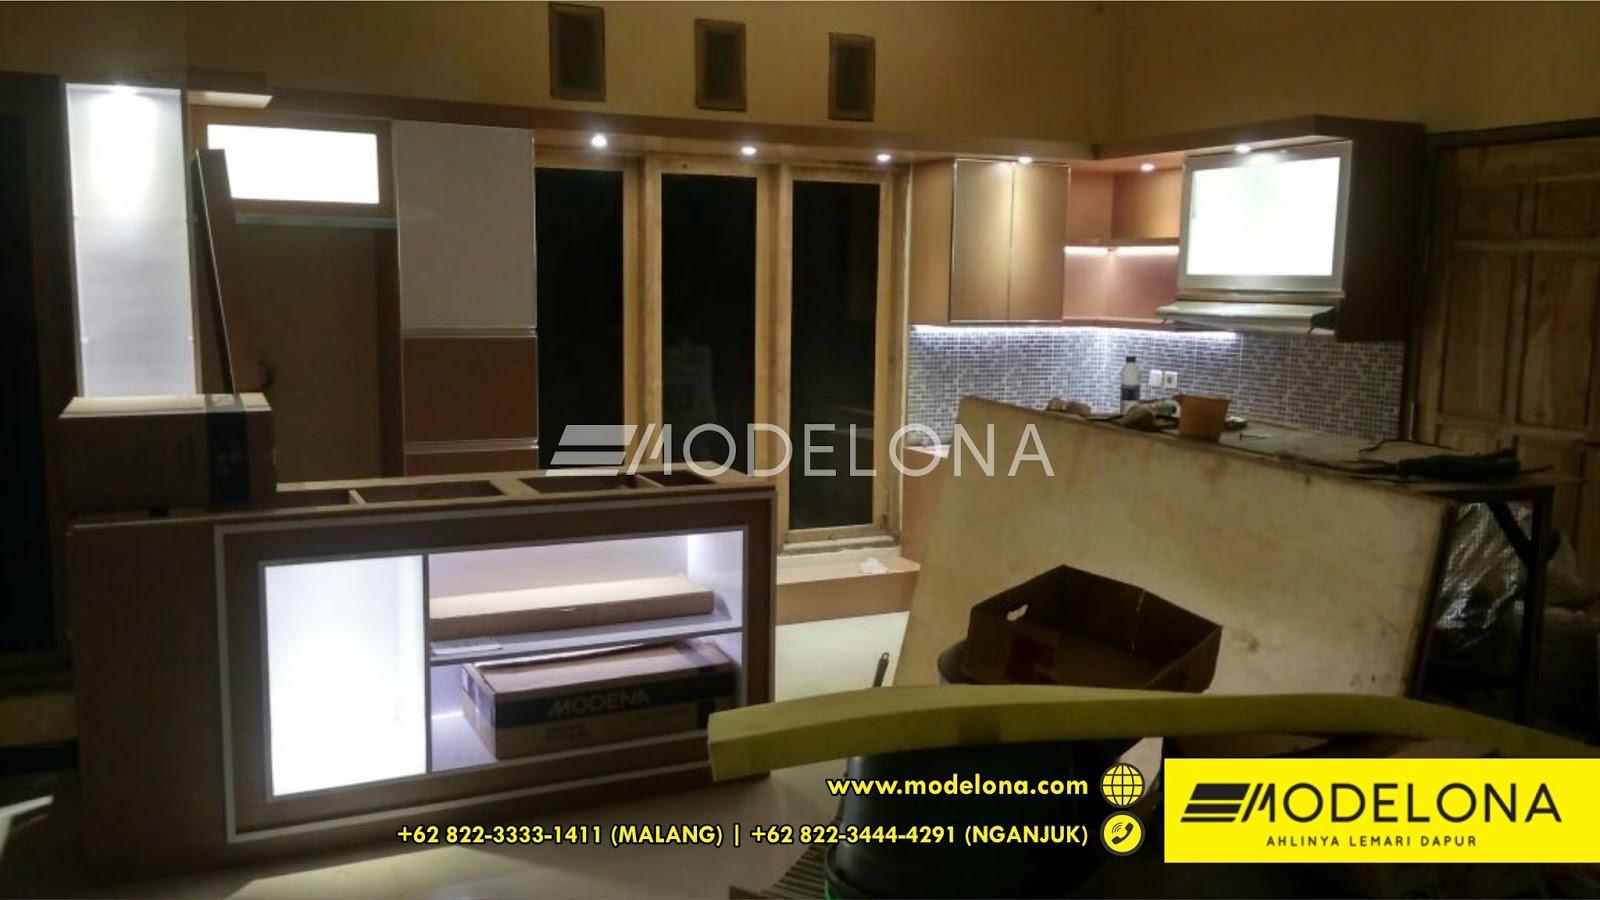 Kitchen set murah kediri kitchen set minimalis kediri jasa kitchen set kediri pembuat